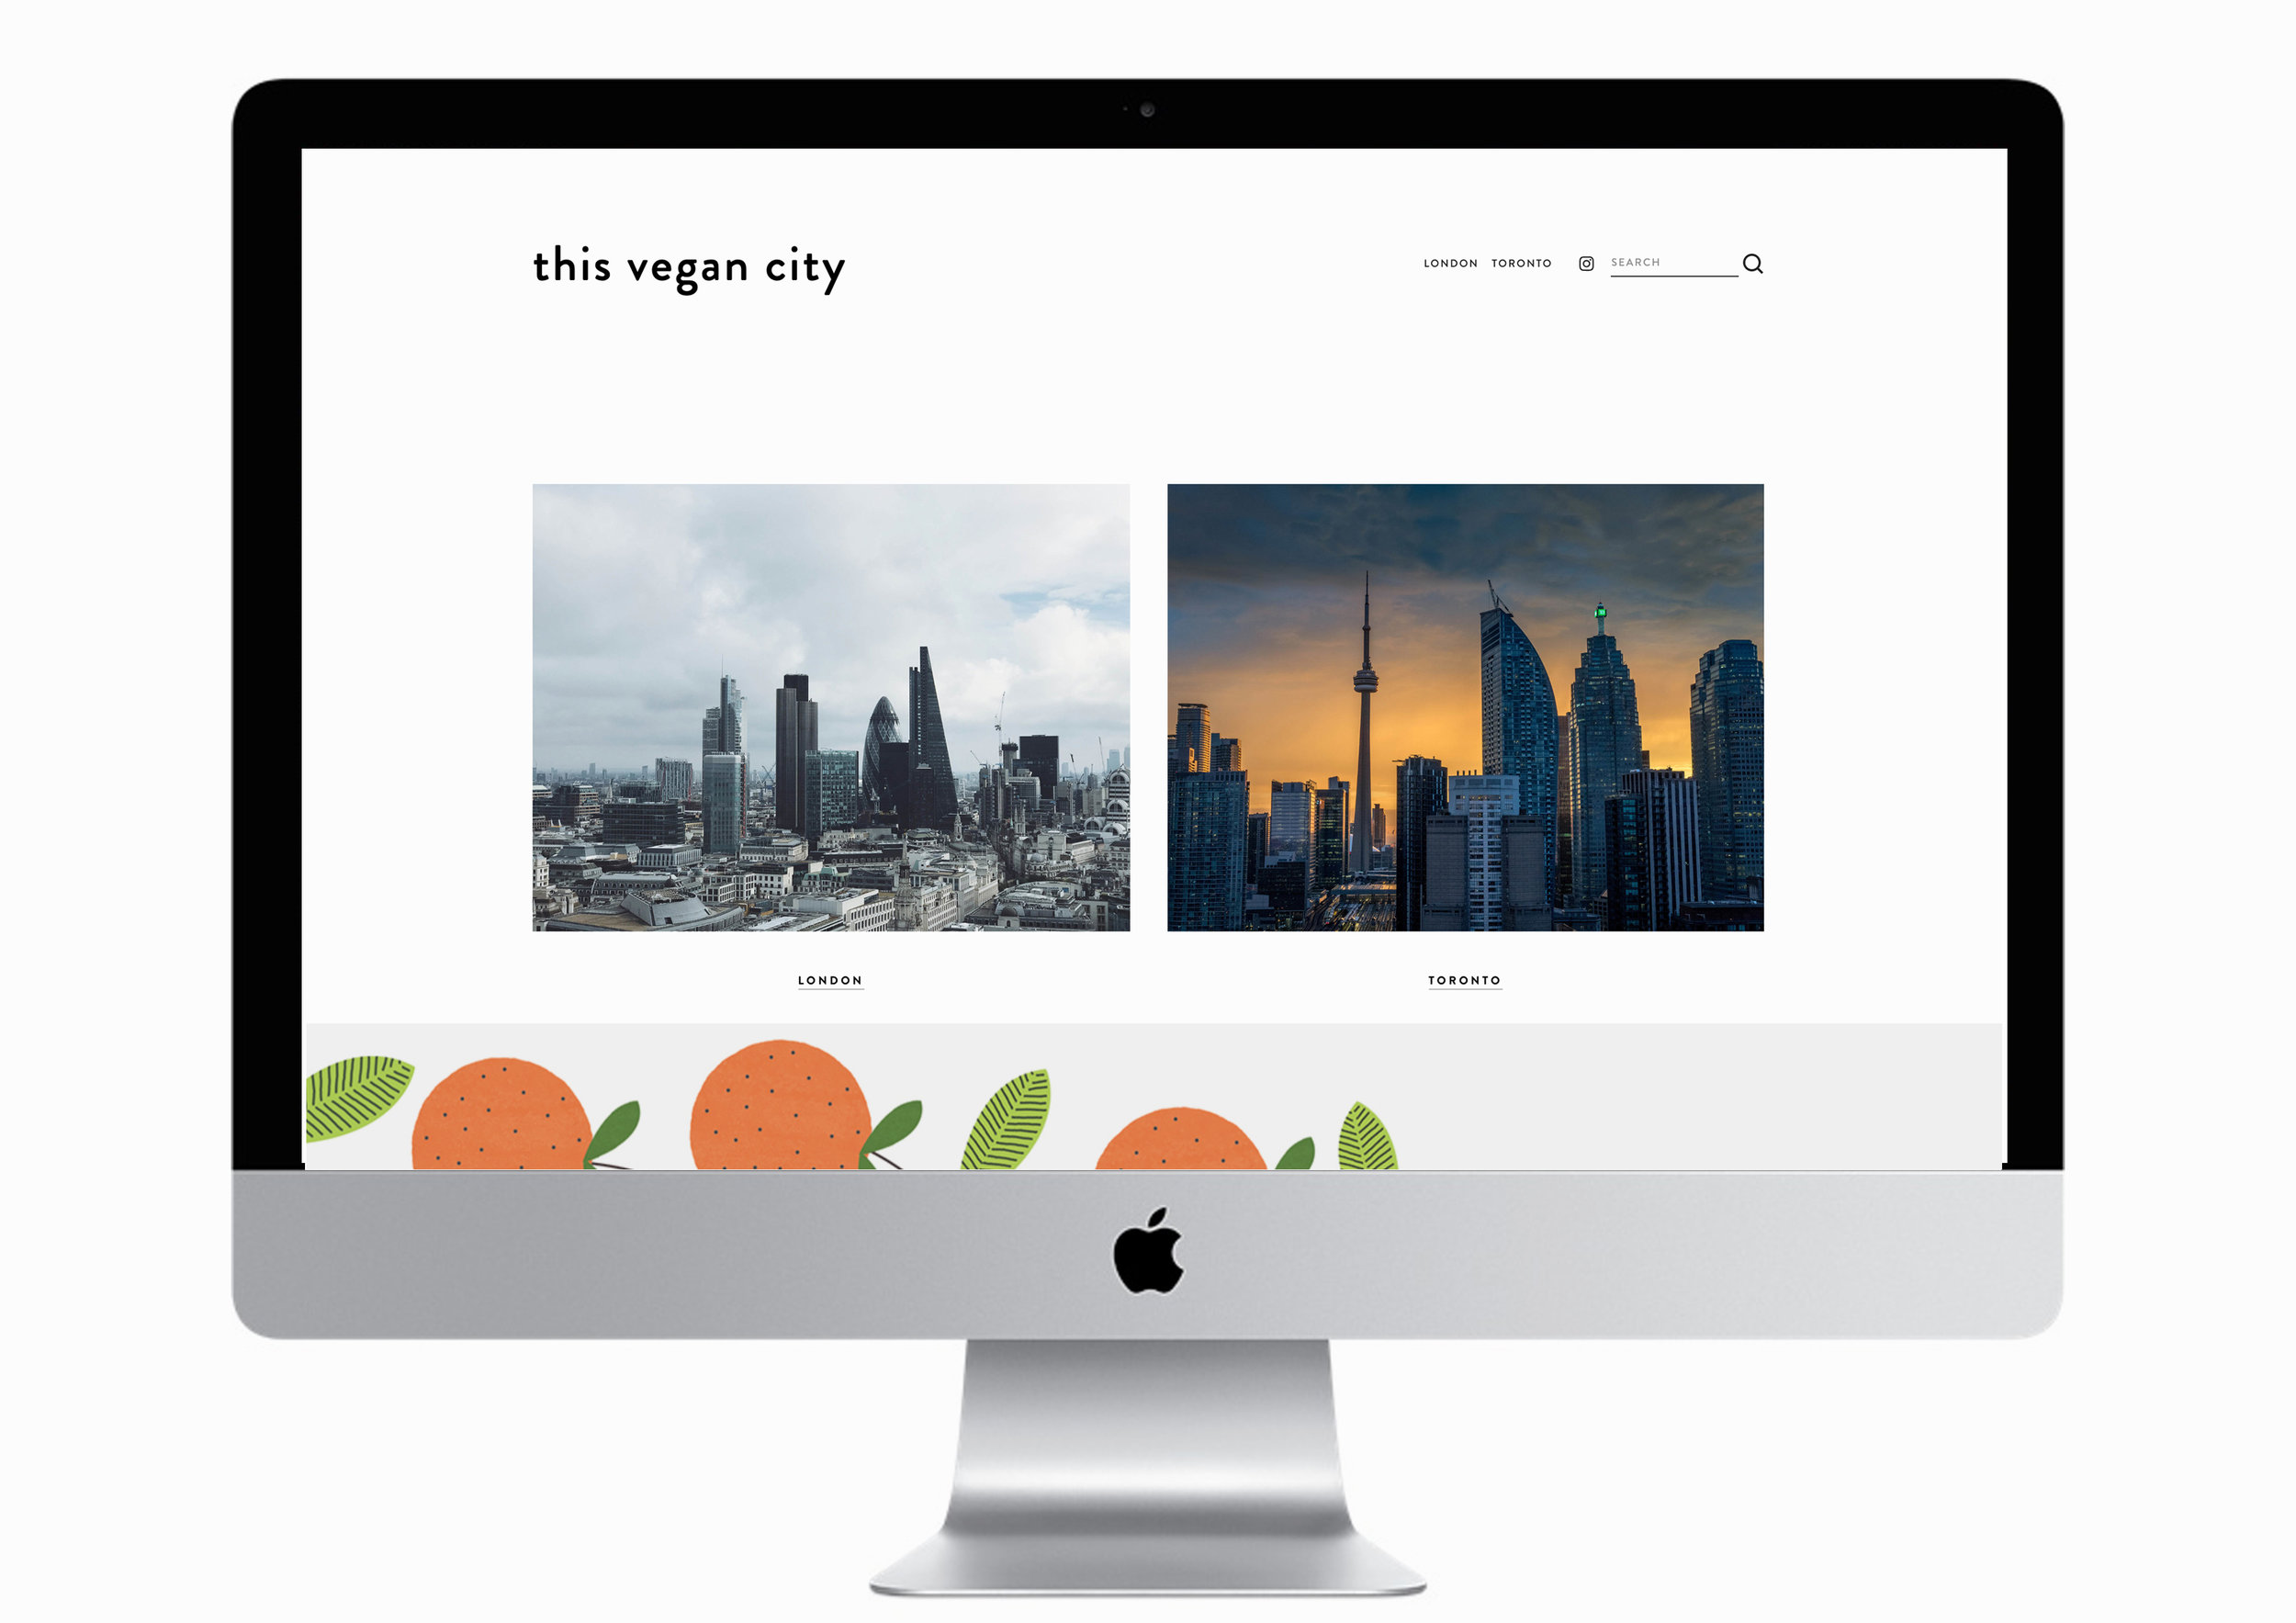 TheVeganCity.jpg